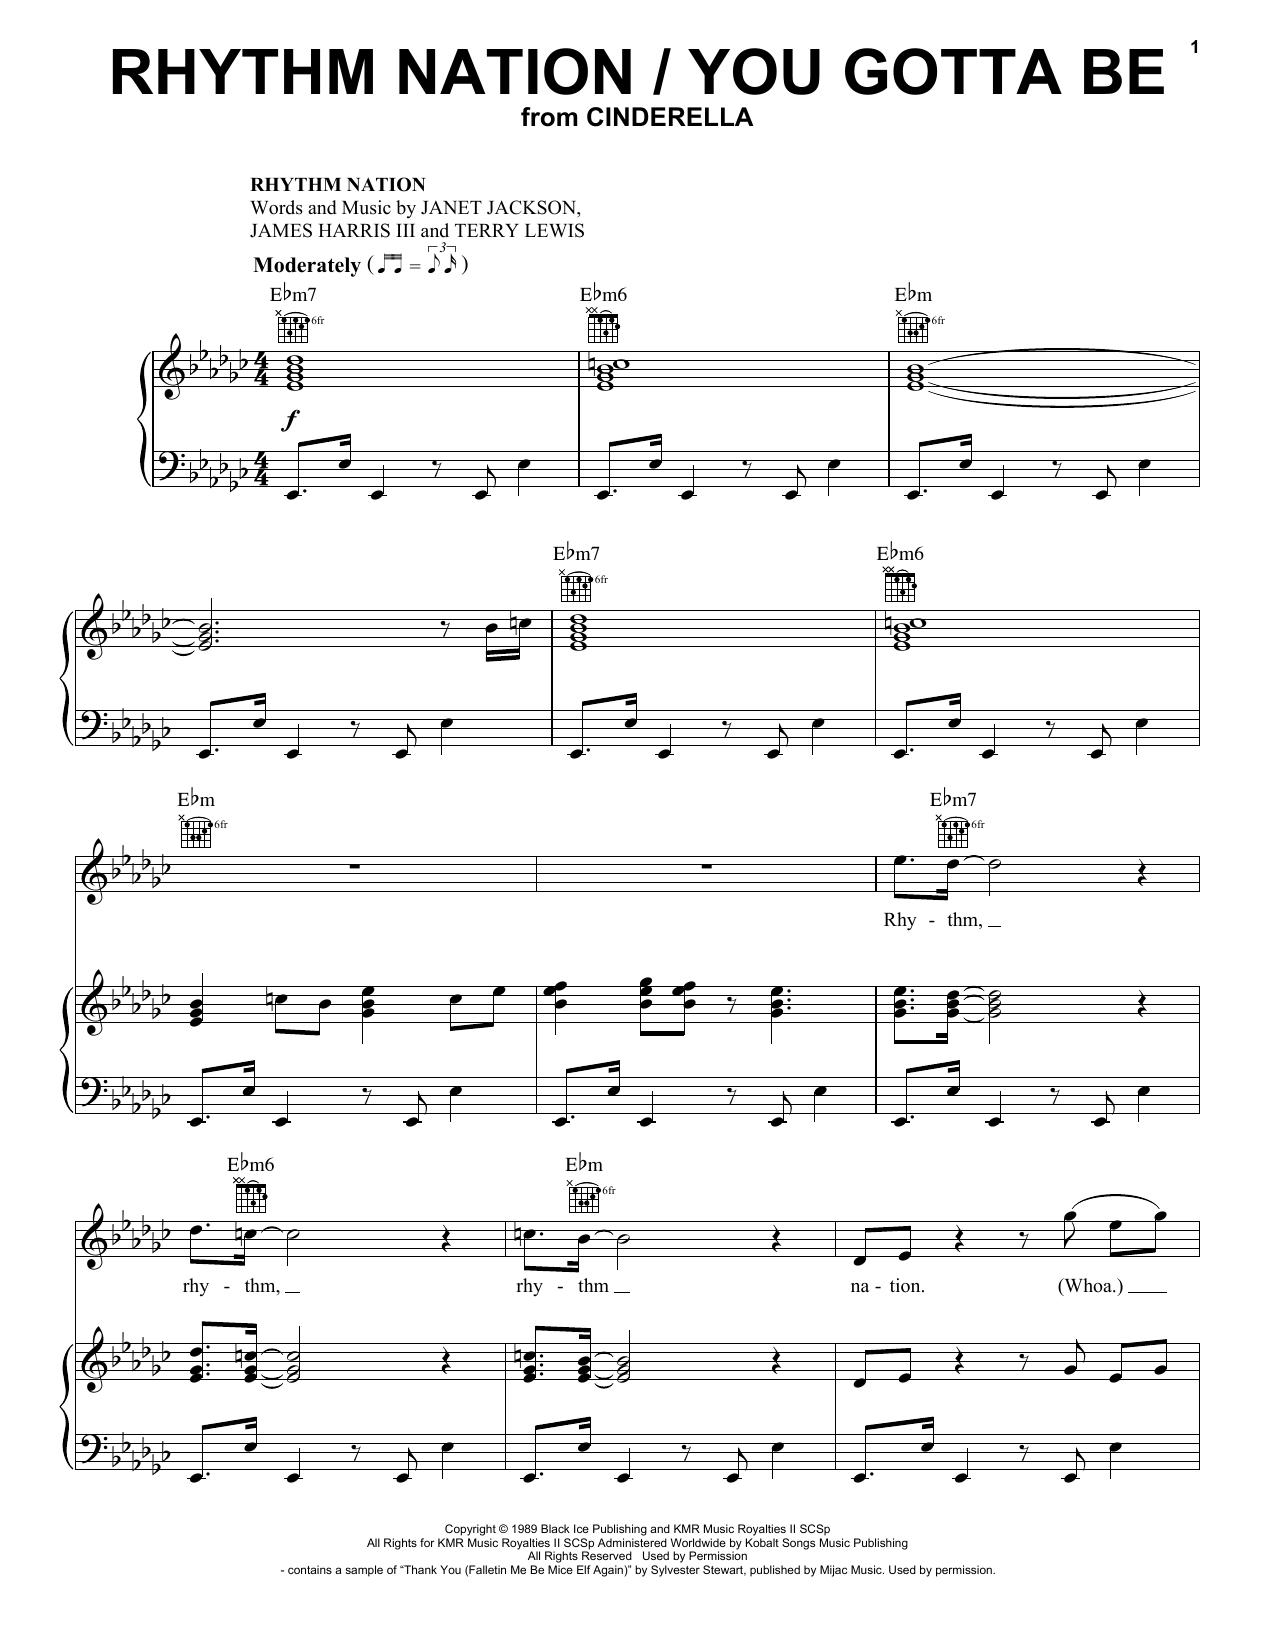 Camila Cabello and Idina Menzel Rhythm Nation / You Gotta Be (from the Amazon Original Movie Cinderella) sheet music notes printable PDF score